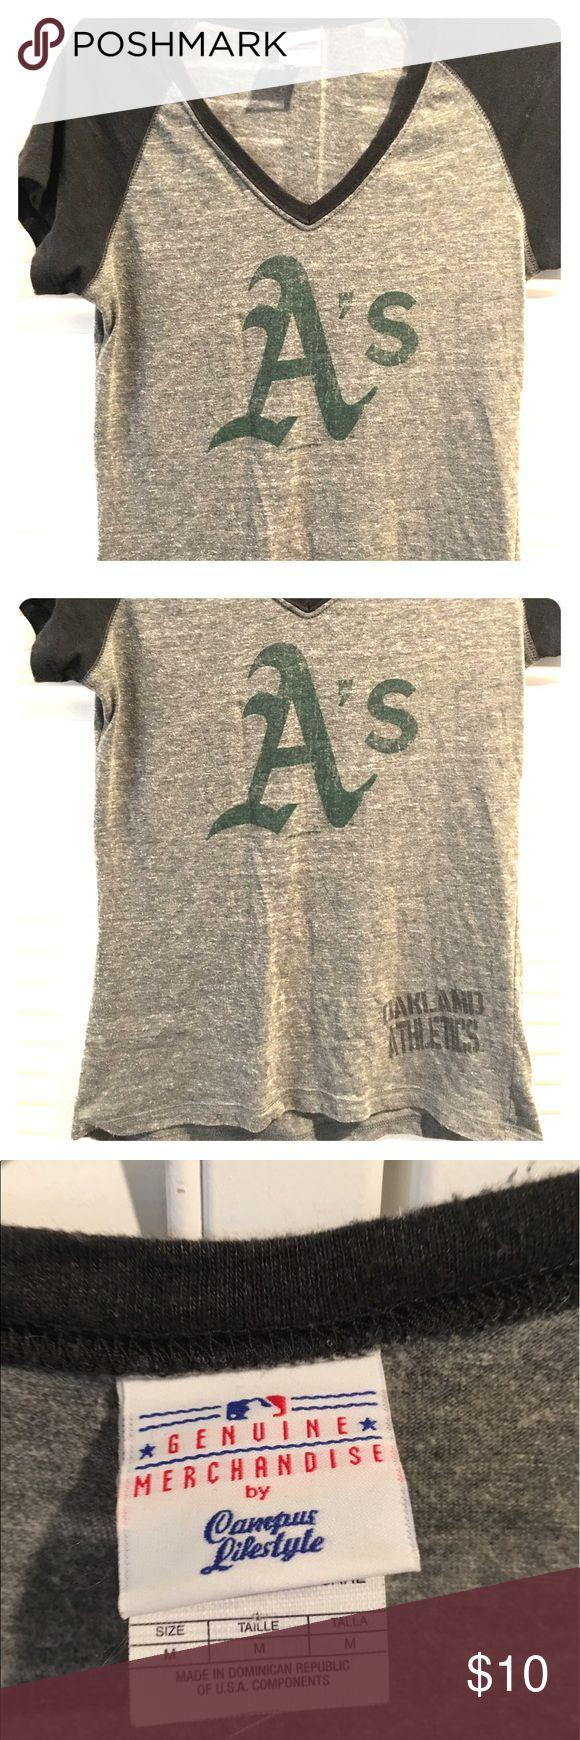 Women's Oakland Athletics t shirt Women's v neck Oakland Athletics t shirt. Tops Tees - Short Sleeve